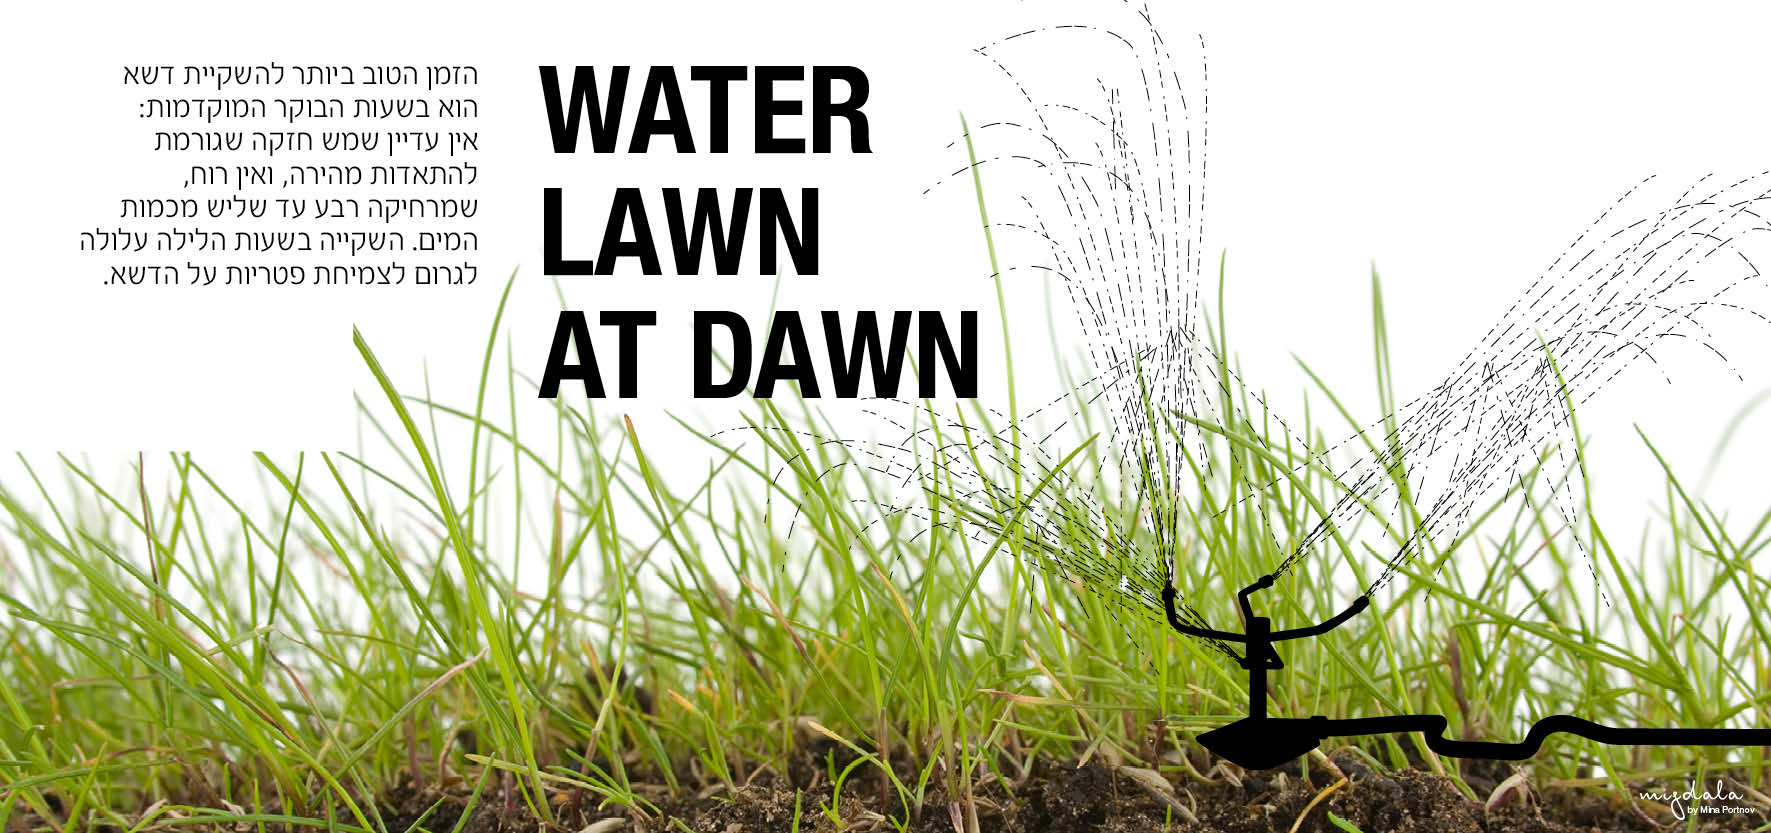 WATER LAWN AT DAWN